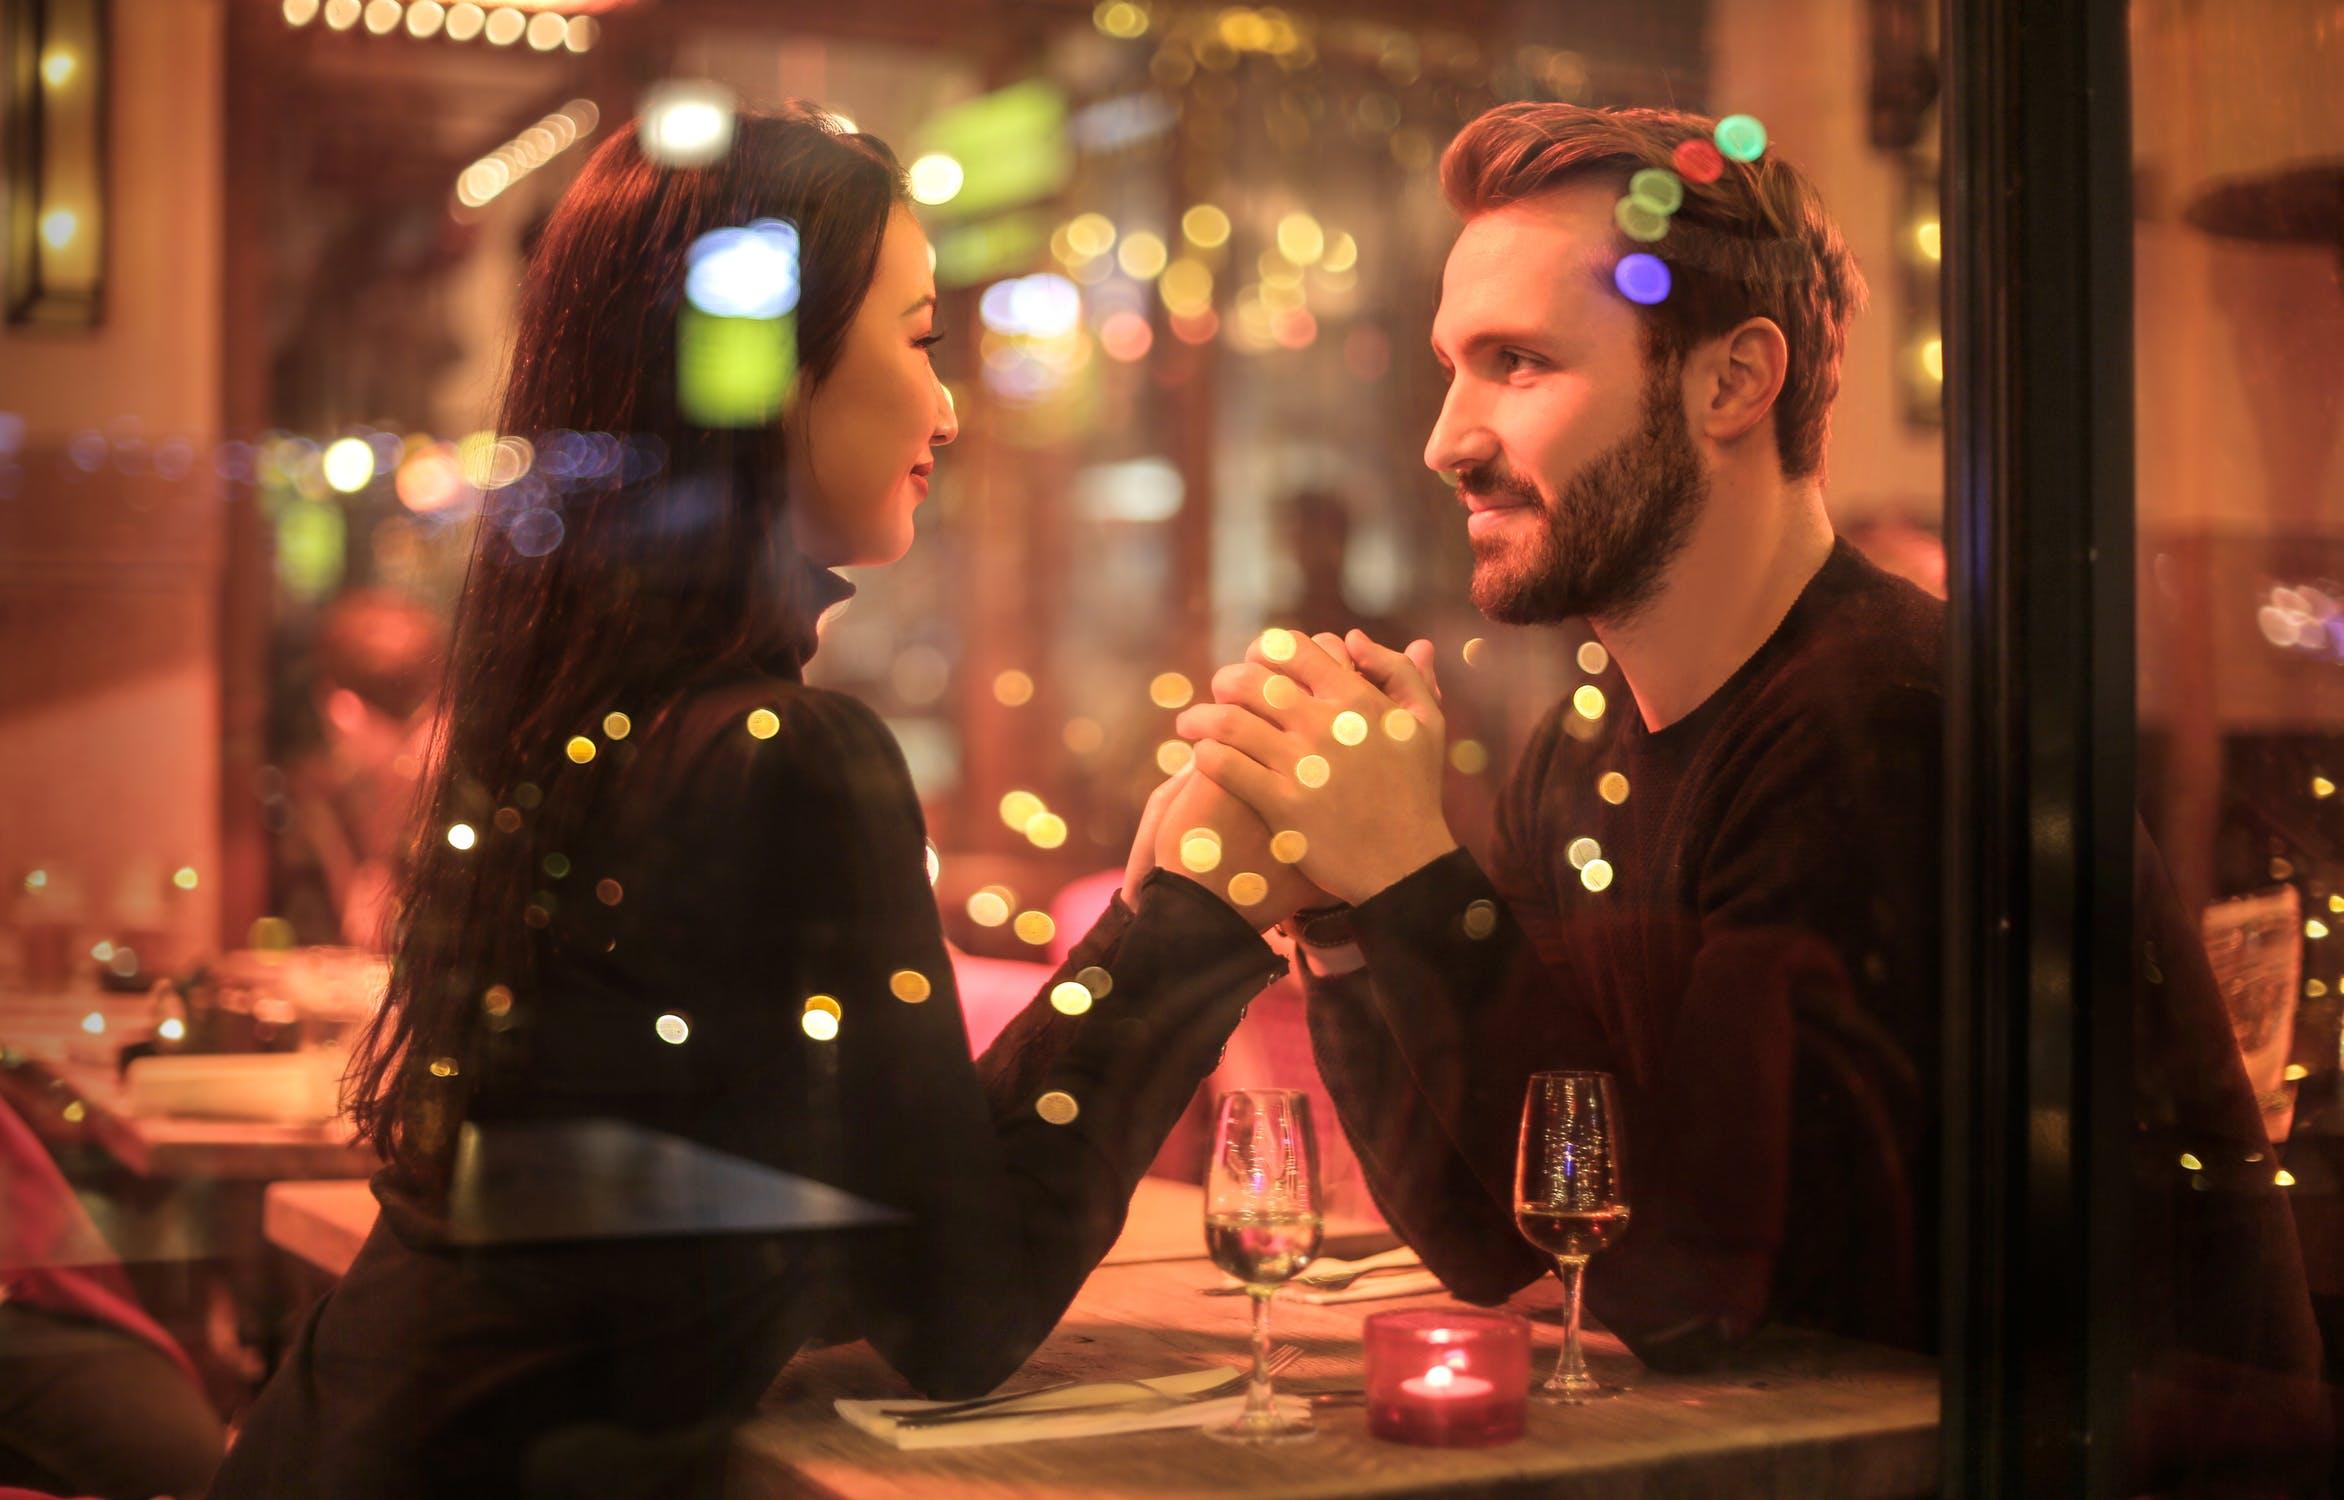 Stroud elämä dating